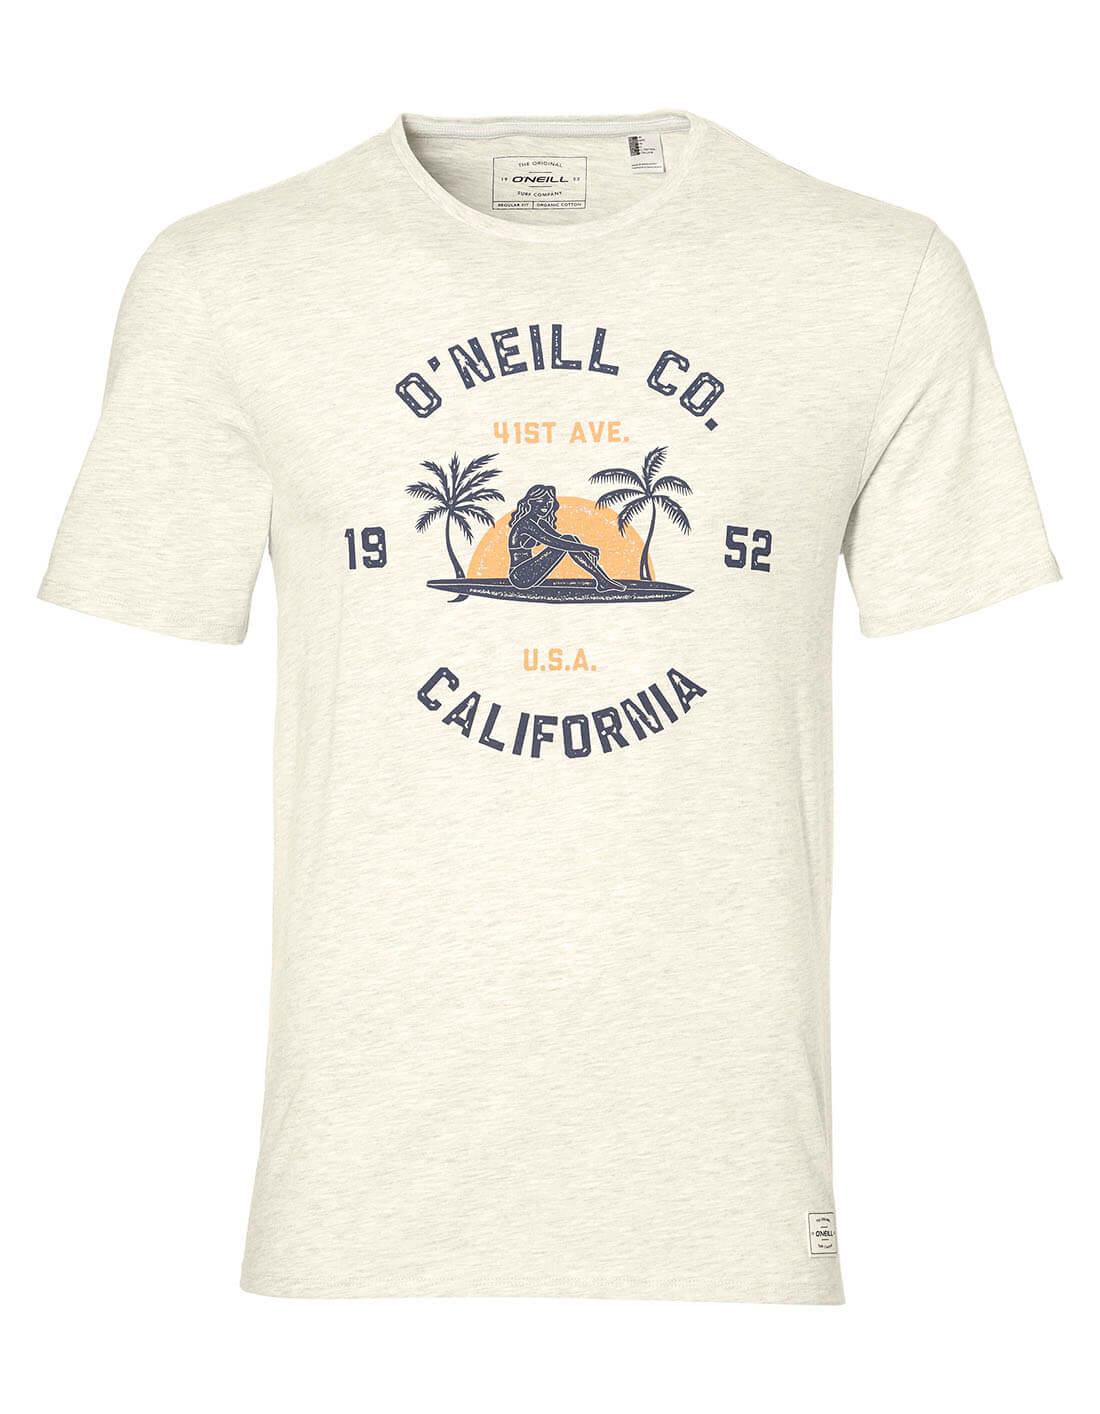 76bc962845 Surf Co póló - O'Neill biopamut férfi póló - EcoWear